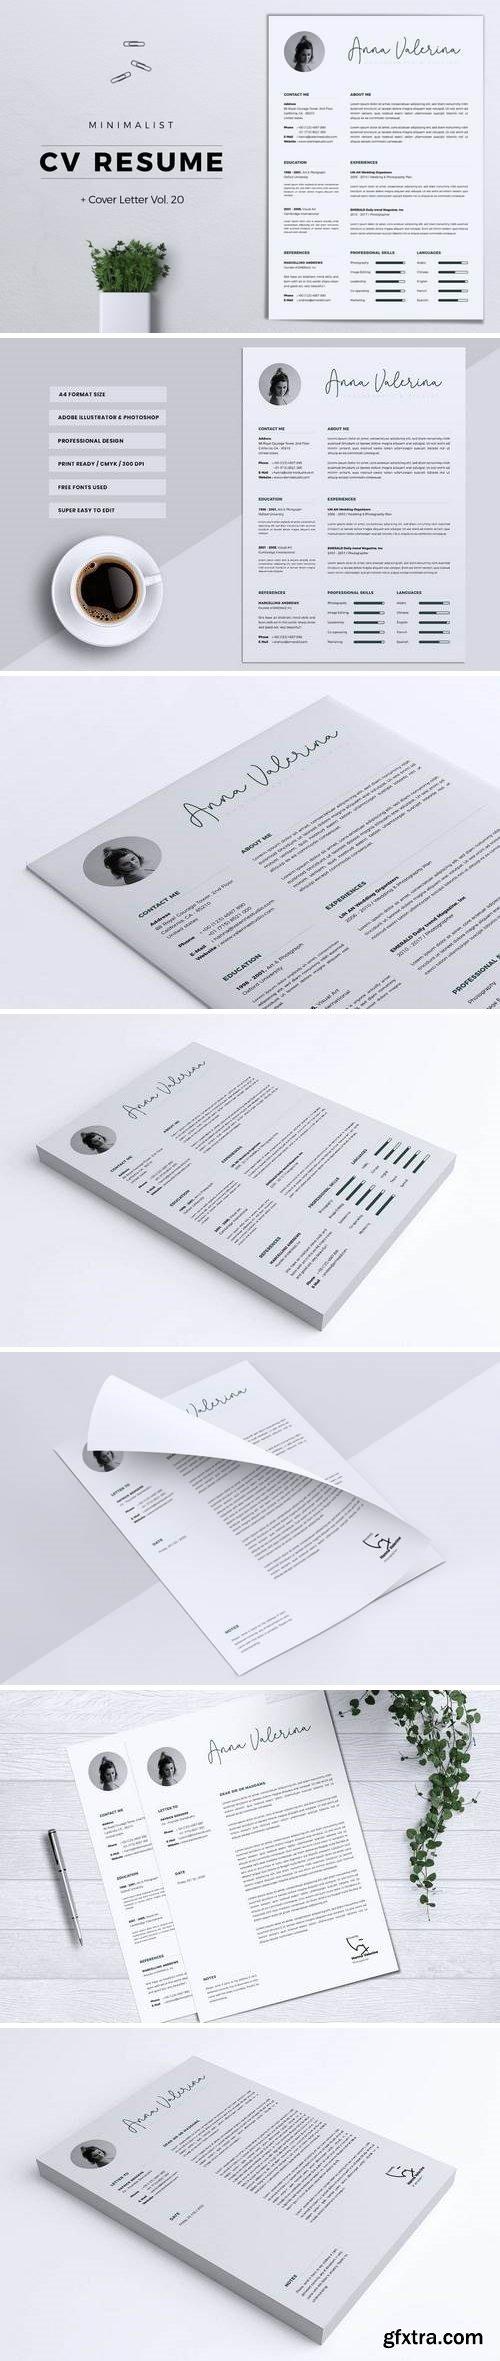 Minimalist CV Resume Vol. 20